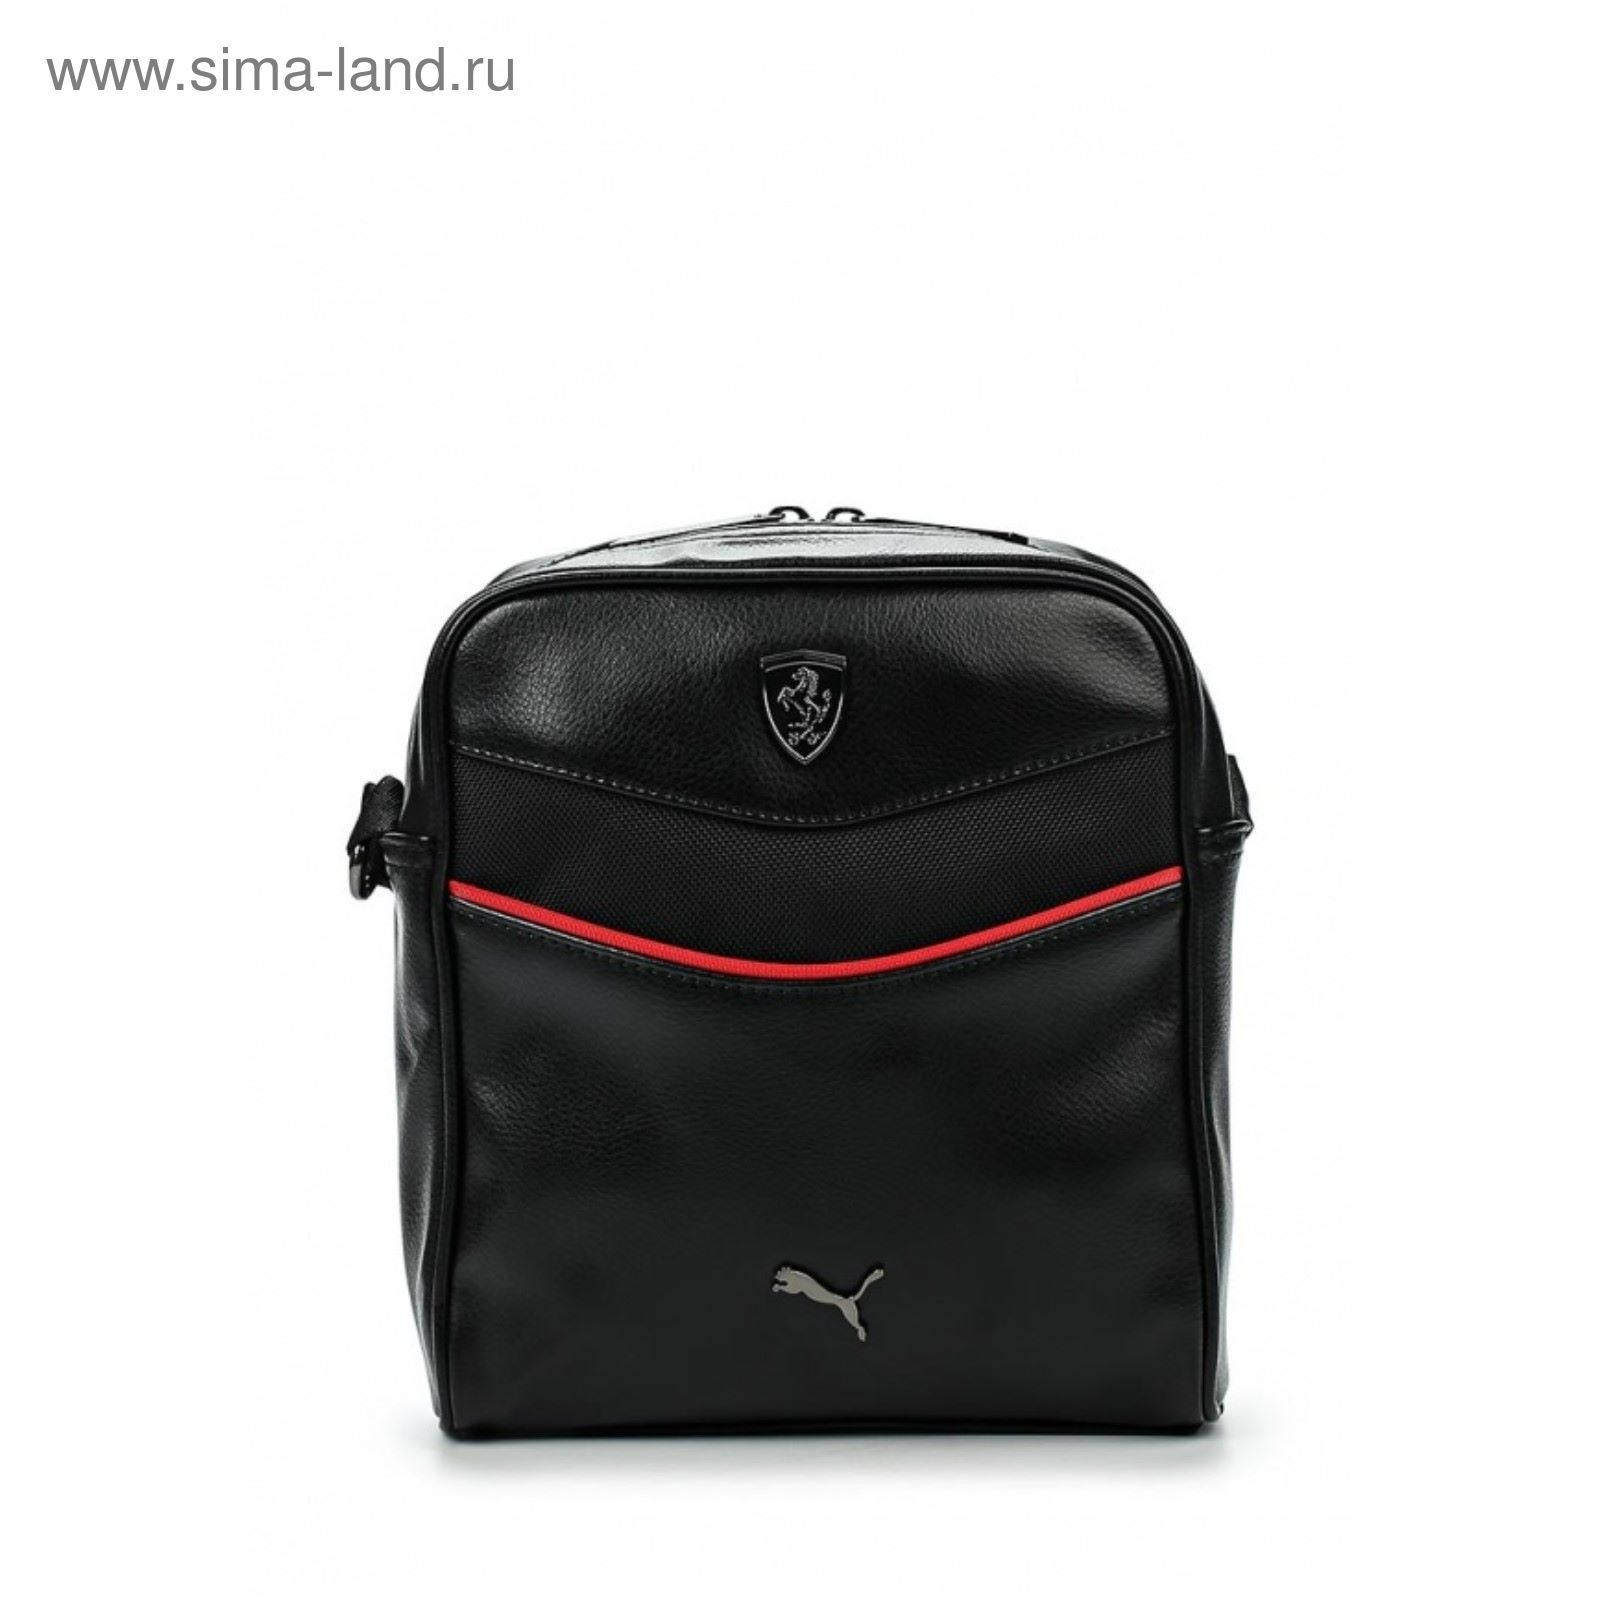 ff049ecf14c7 Сумка унисекс PUMA Ferrari LS Portable 7394101 (2350315) - Купить по ...